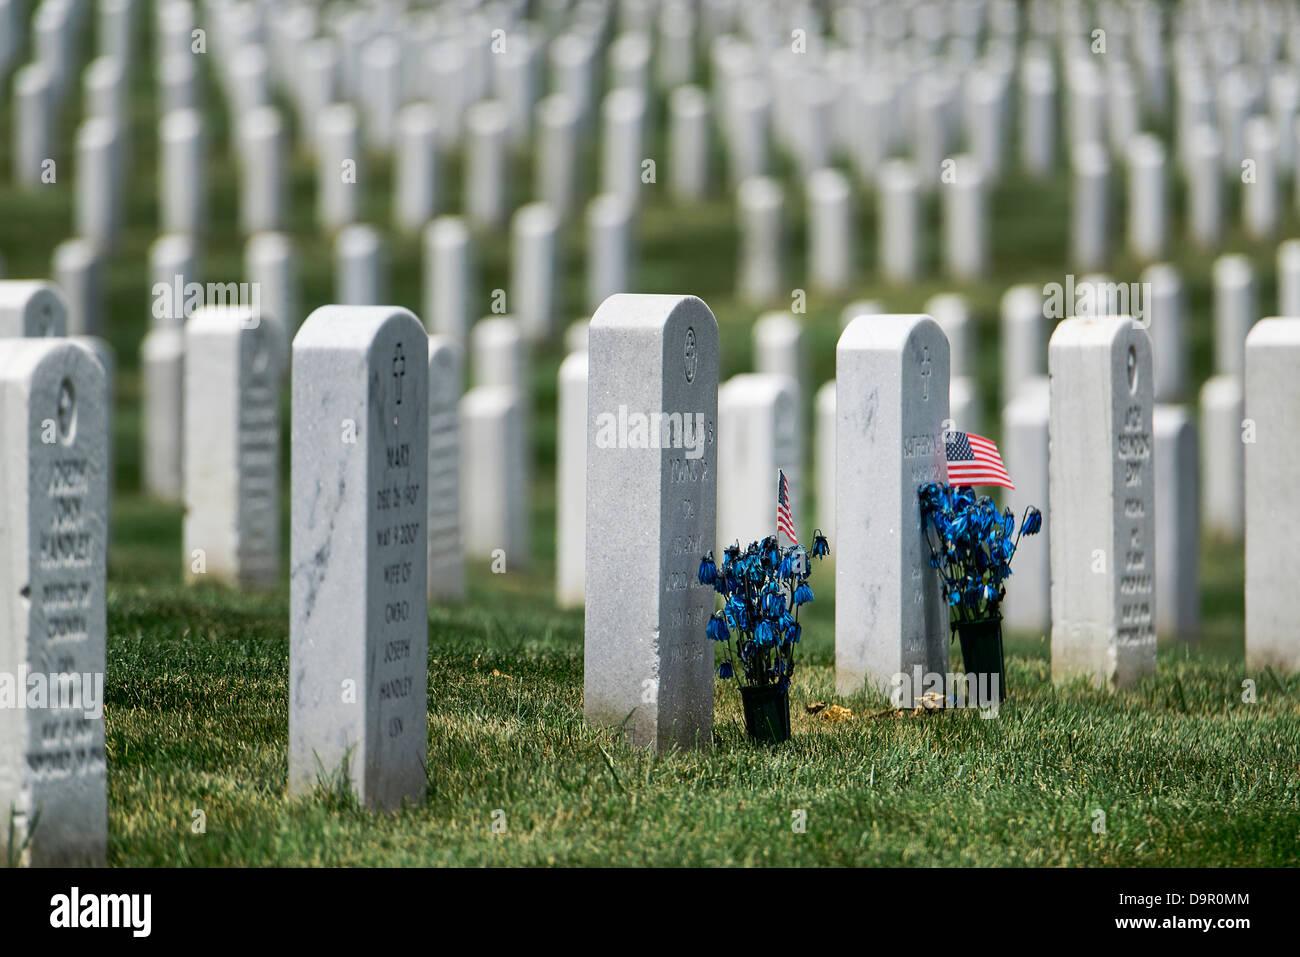 Soldier graves, Arlington National Cemetery, Virginia, USA - Stock Image